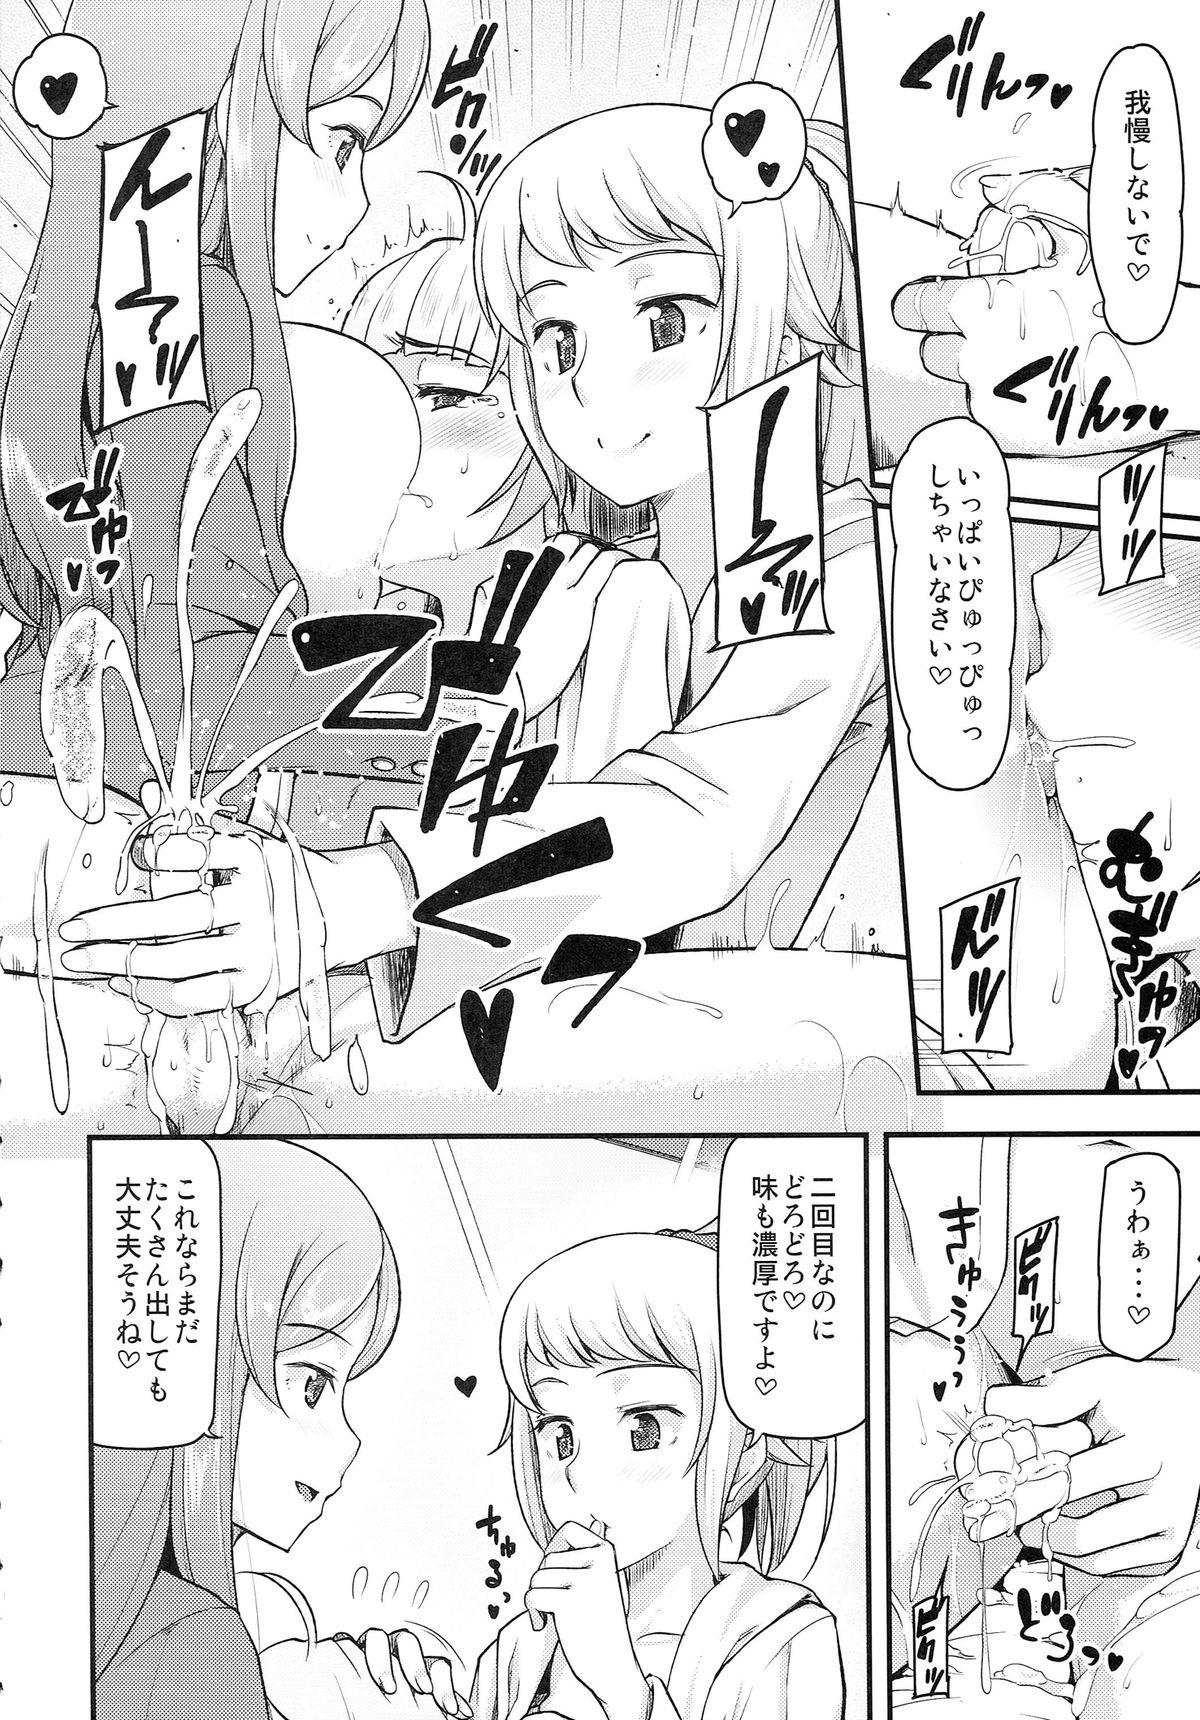 (C87) [from SCRATCH (Johnny) Amatoro Fighters Fumina senpai to Mirai oneechan no baai  (Gundam Build Fighters Try) 20